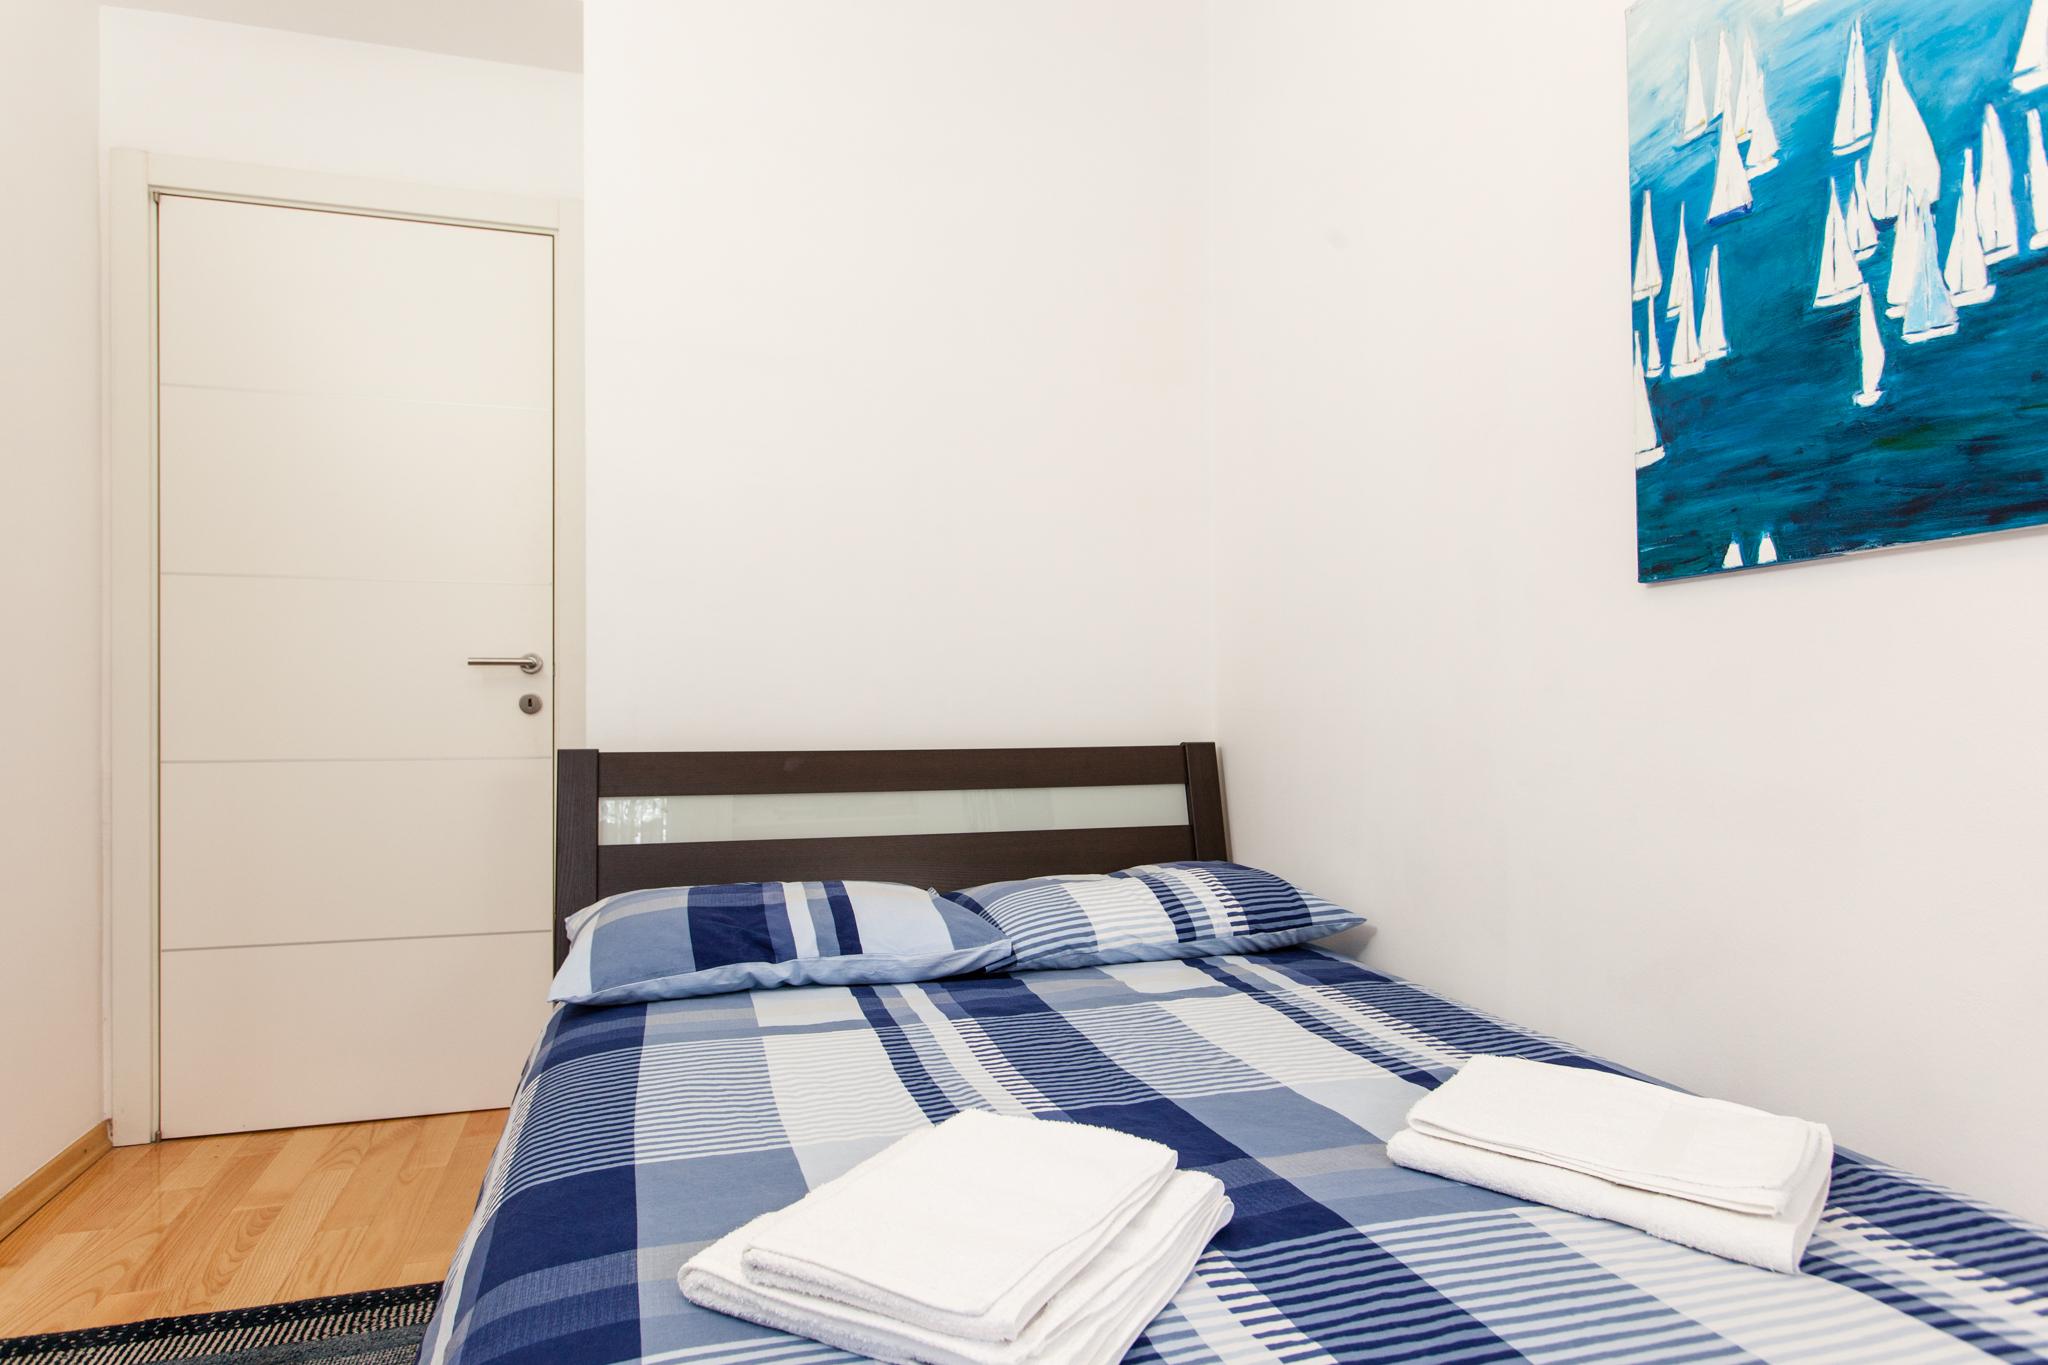 Apartment Split - Aspalathos (13)